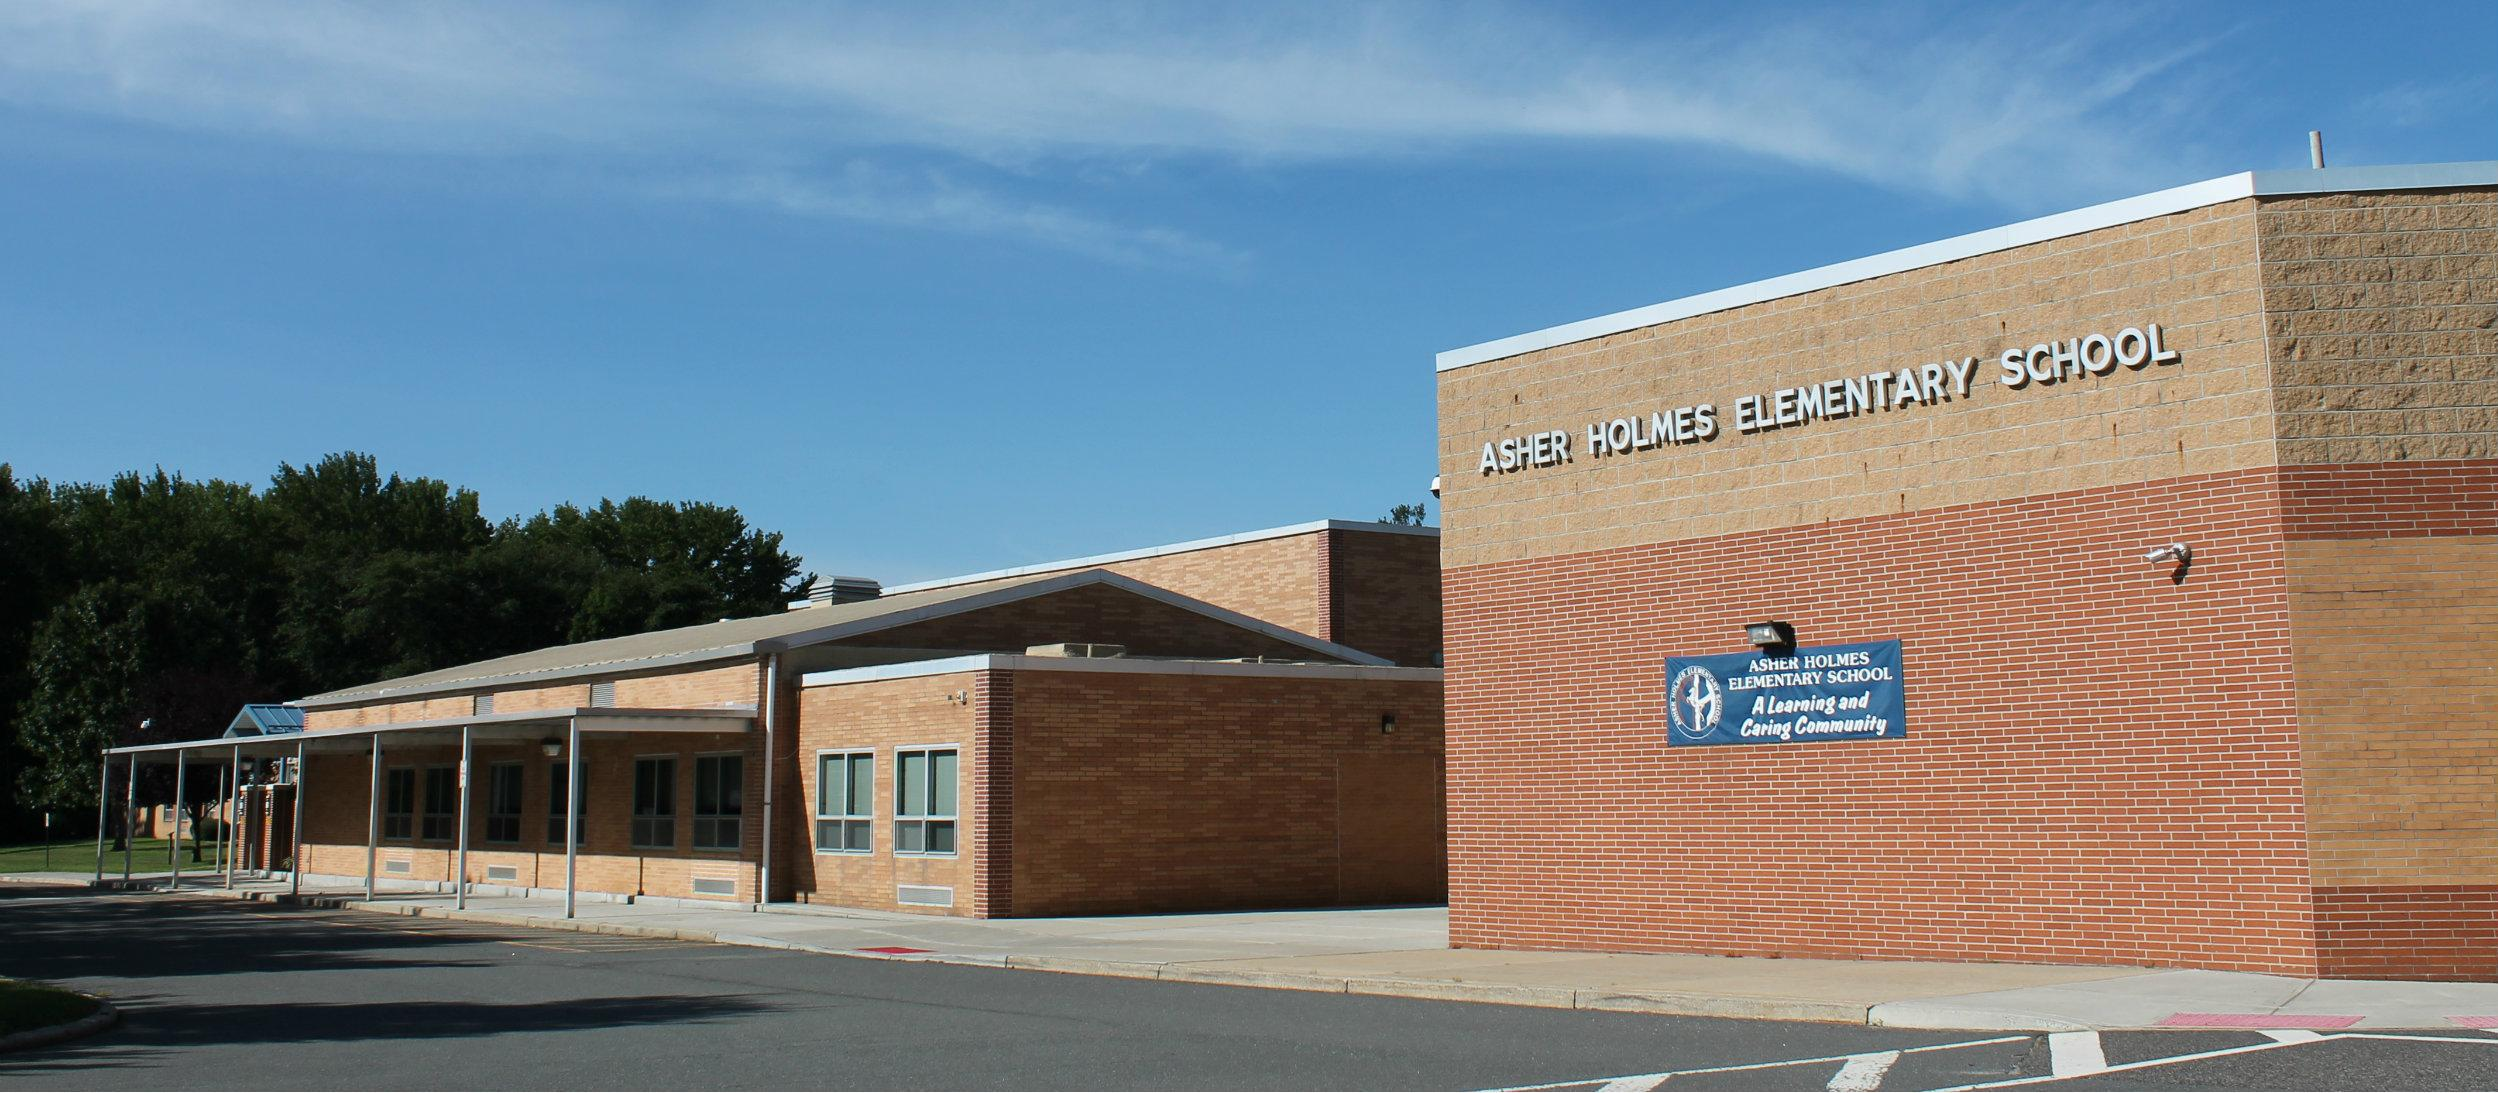 Asher Holmes Elementary School